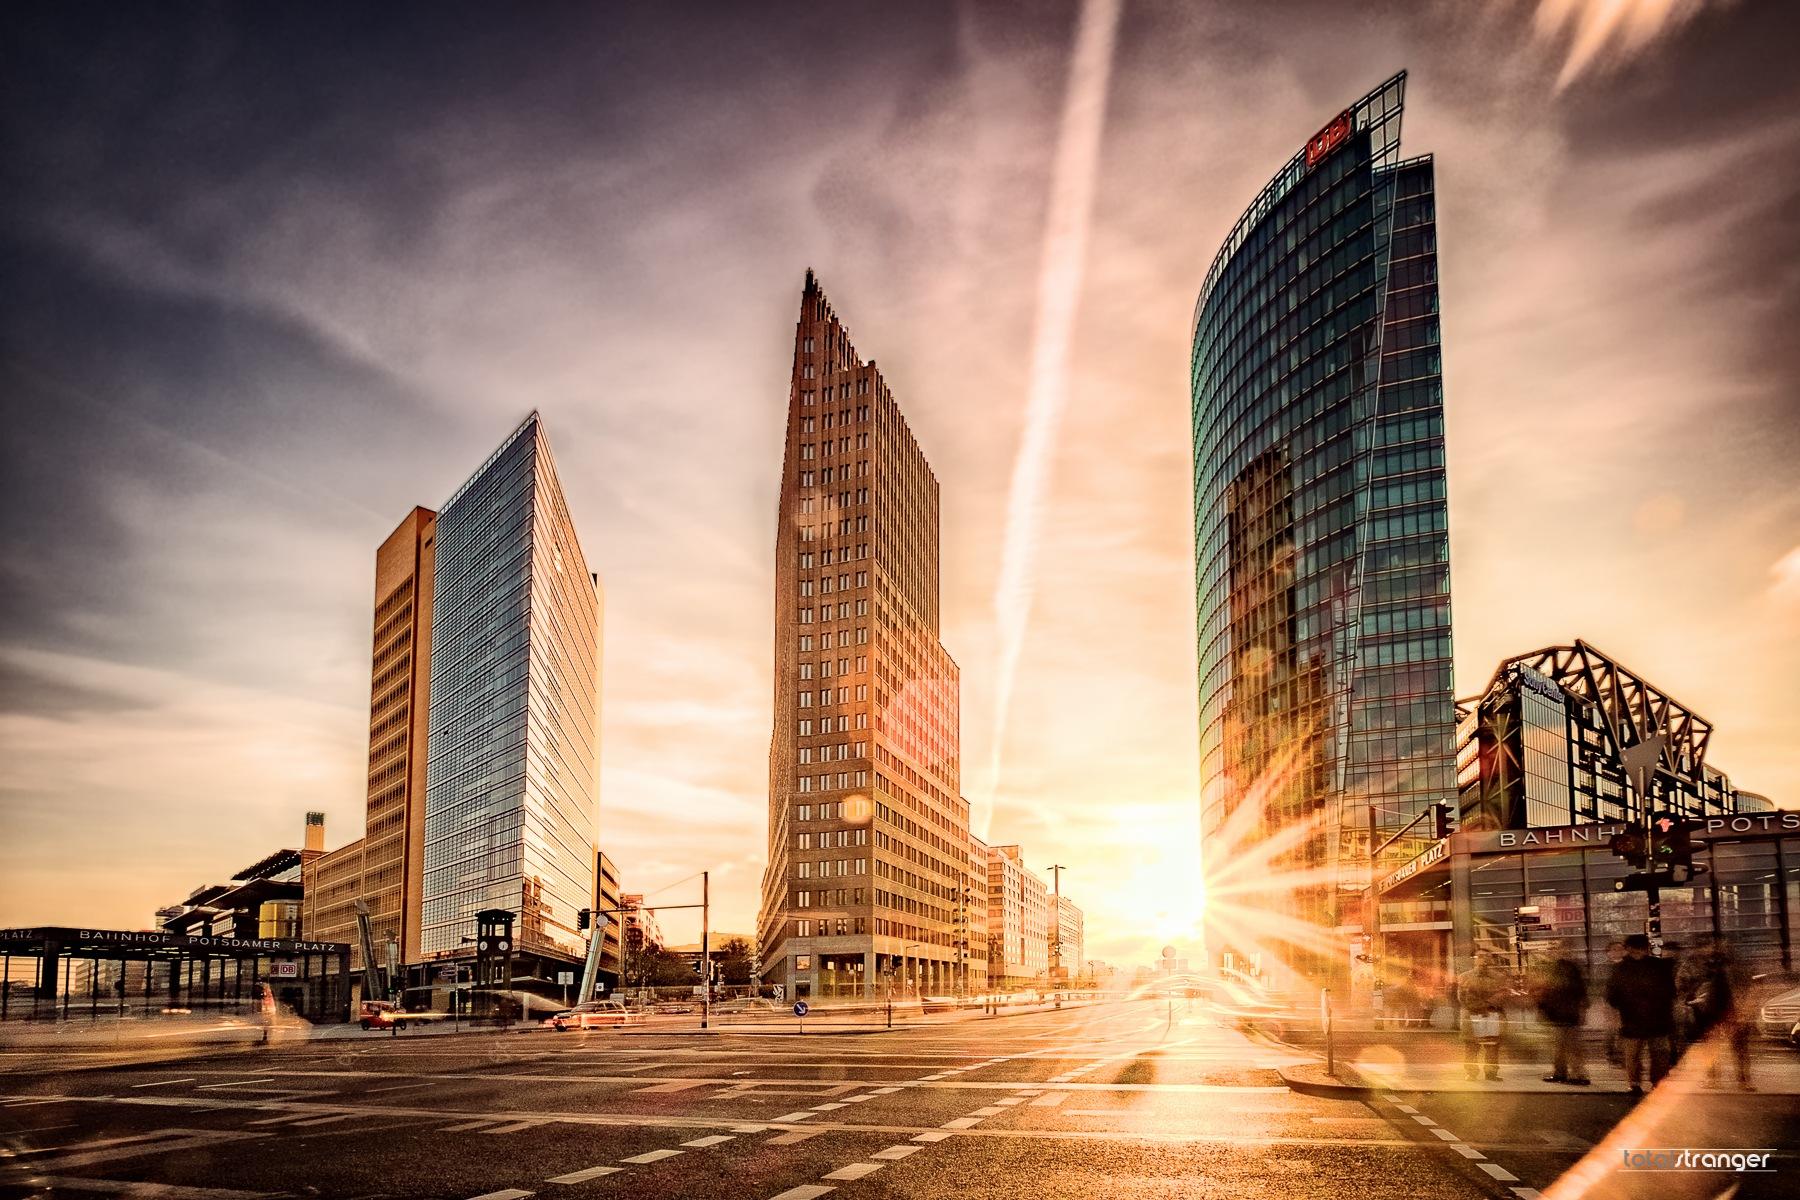 Berlin by totalstranger